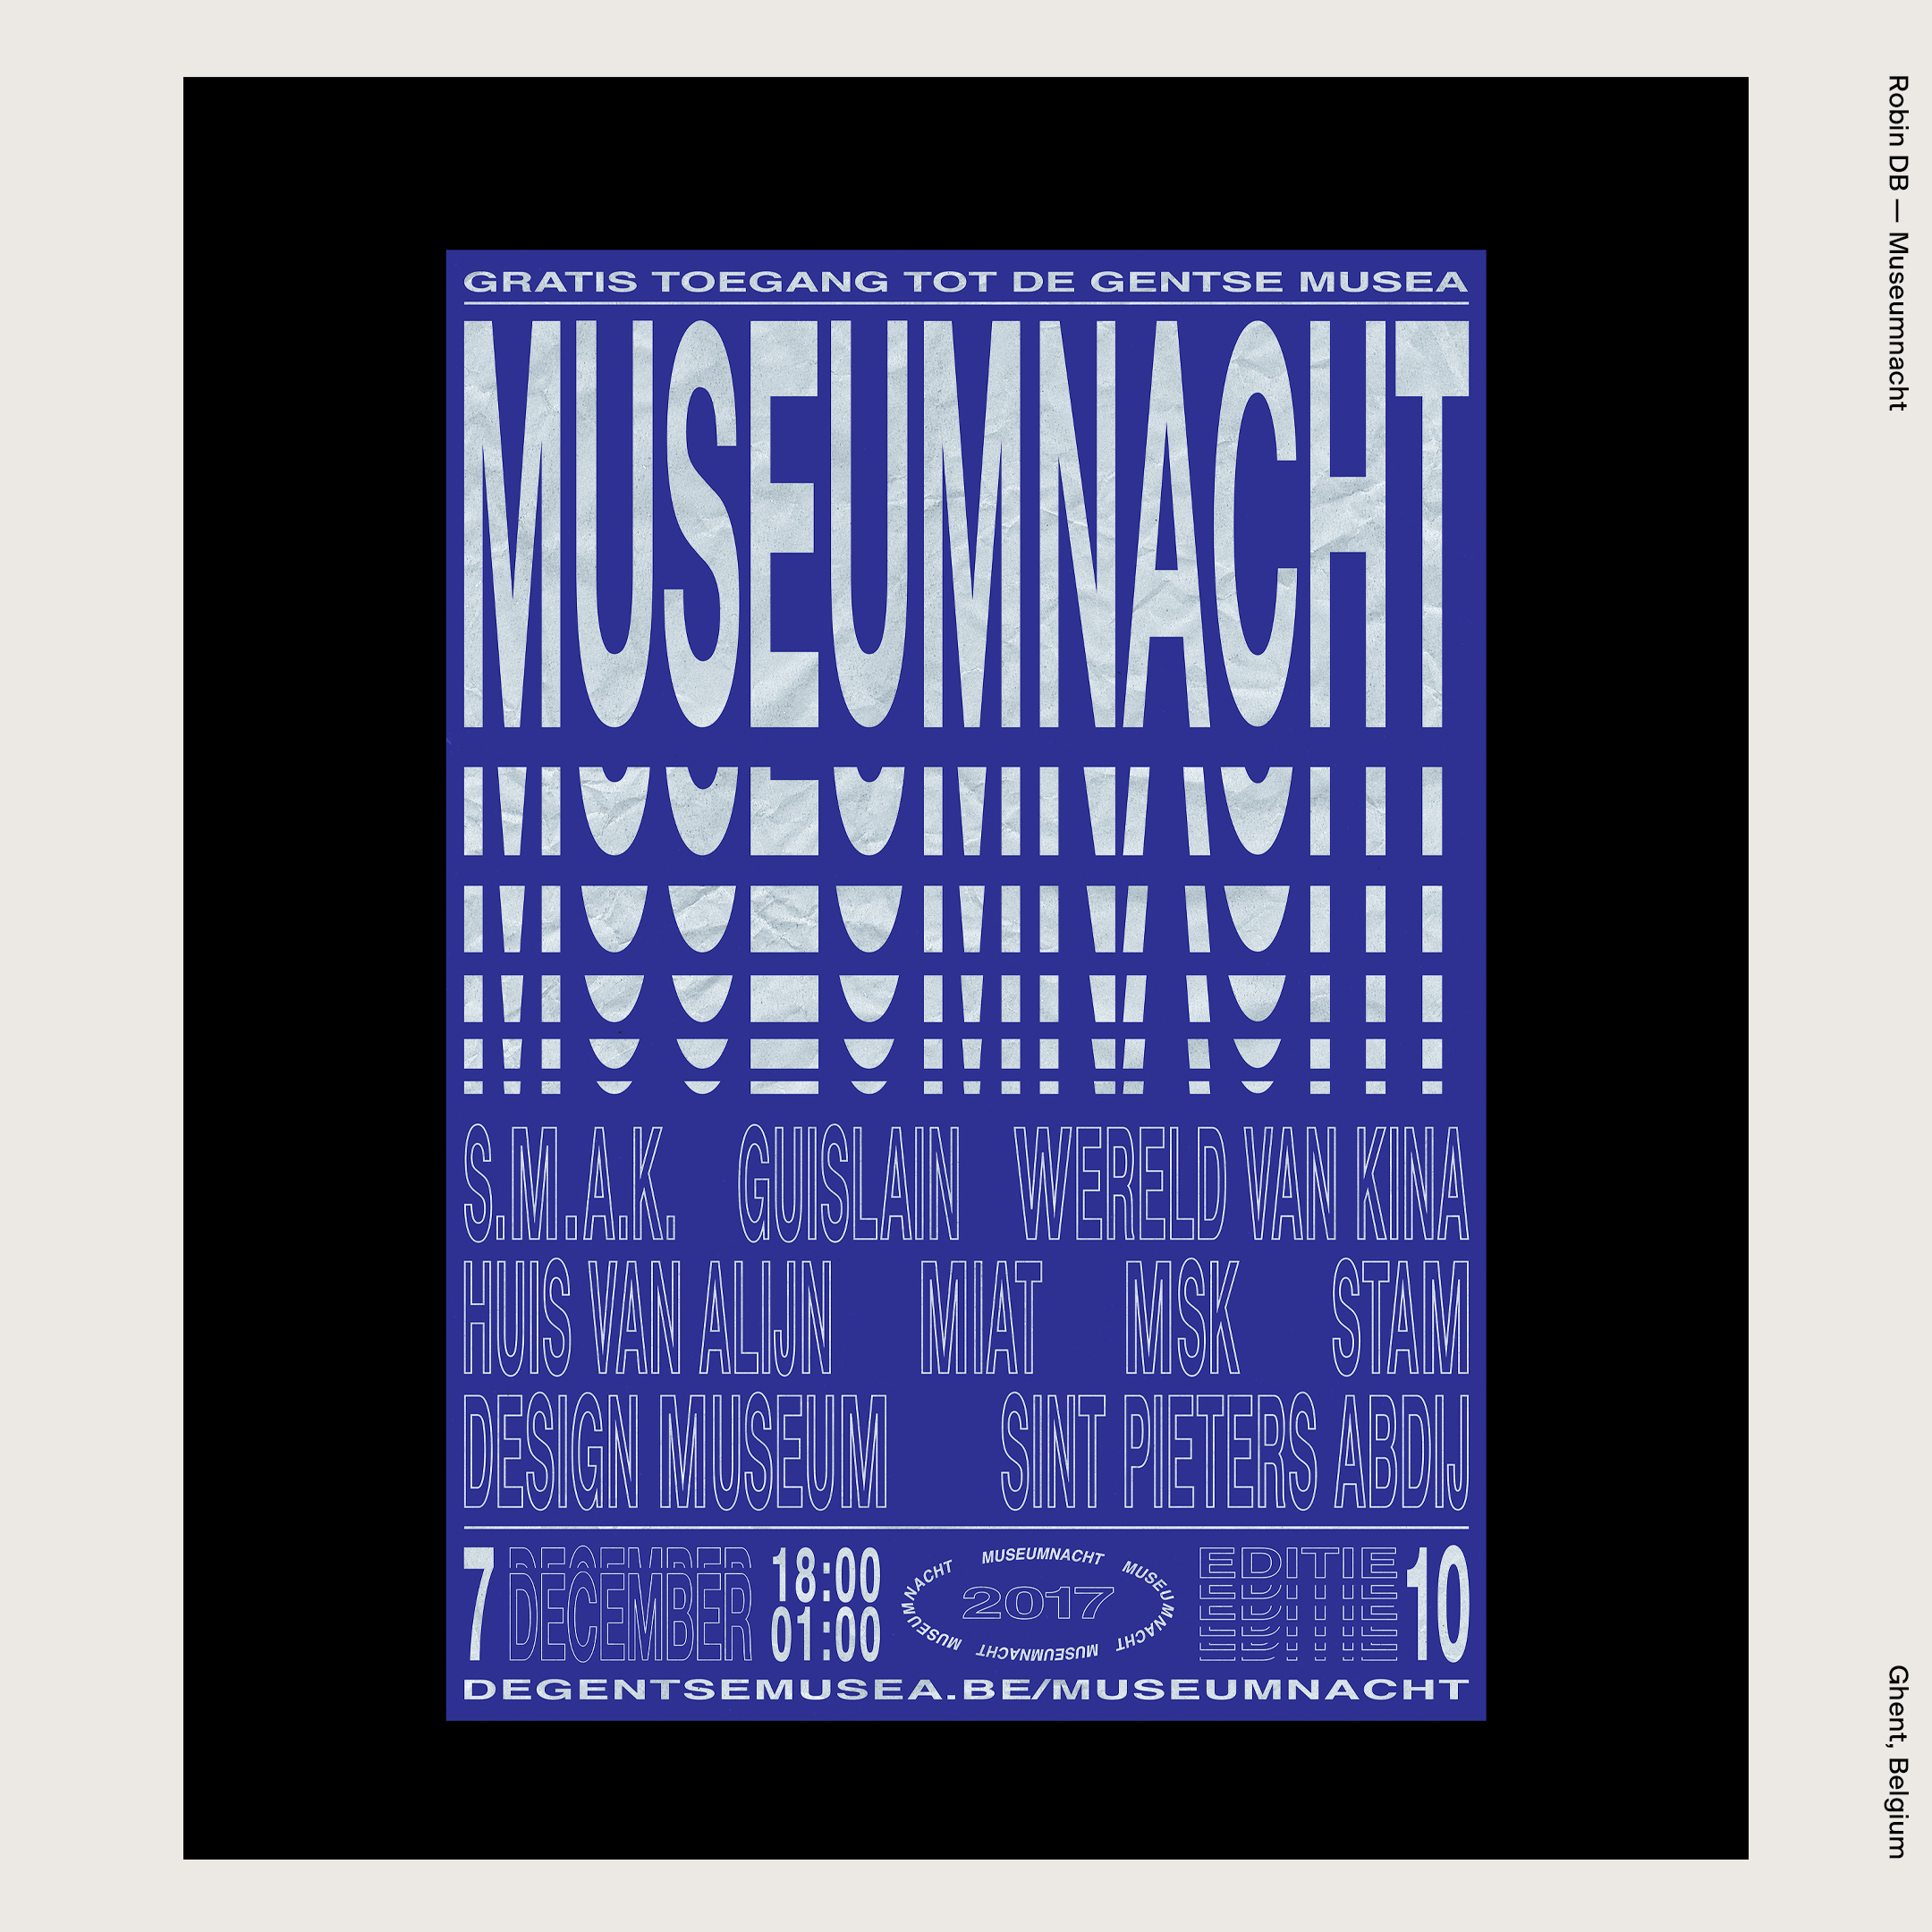 Robin DB —Museumnacht